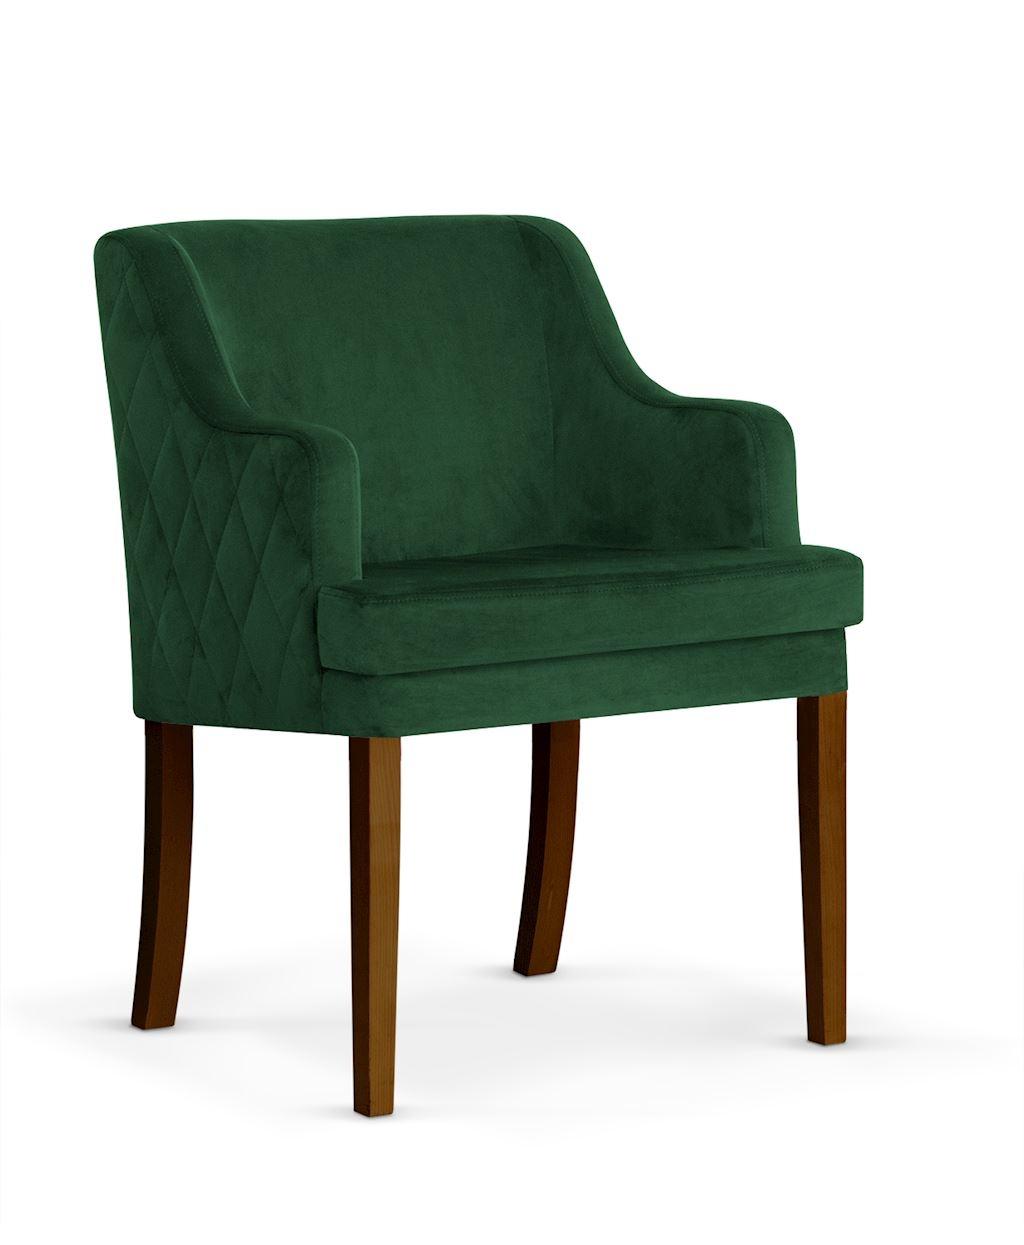 Fotoliu fix tapitat cu stofa, cu picioare din lemn Grand Green / Walnut, l58xA60xH89 cm imagine